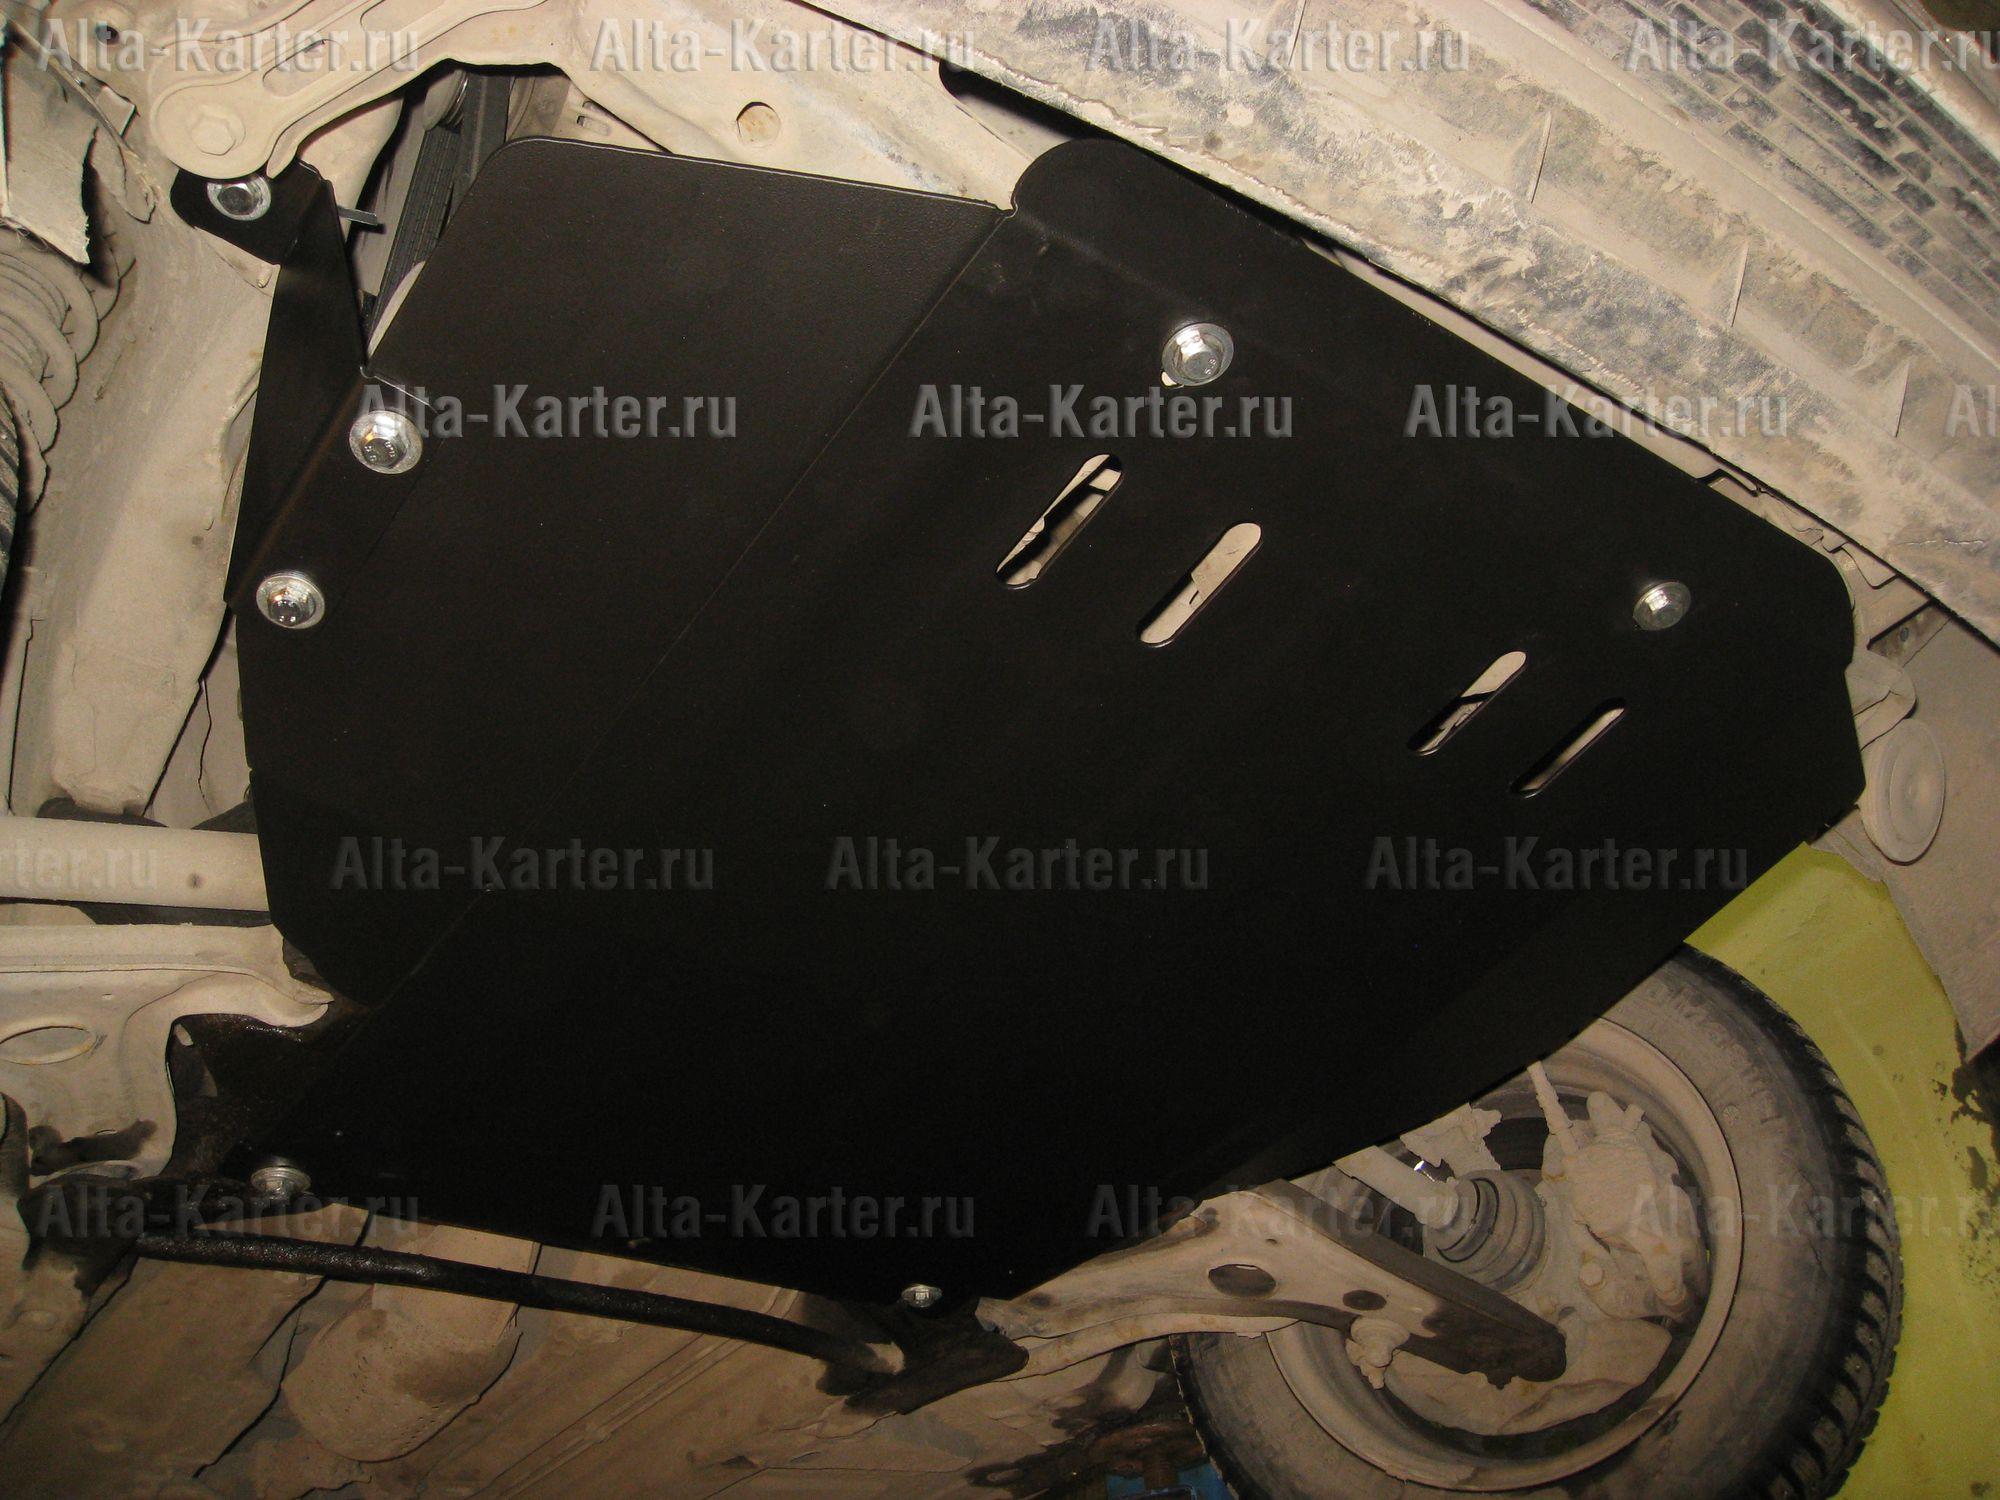 Защита Alfeco для картера и КПП Volkswagen Golf III c гидроусилителем 1991-1997. Артикул ALF.26.25